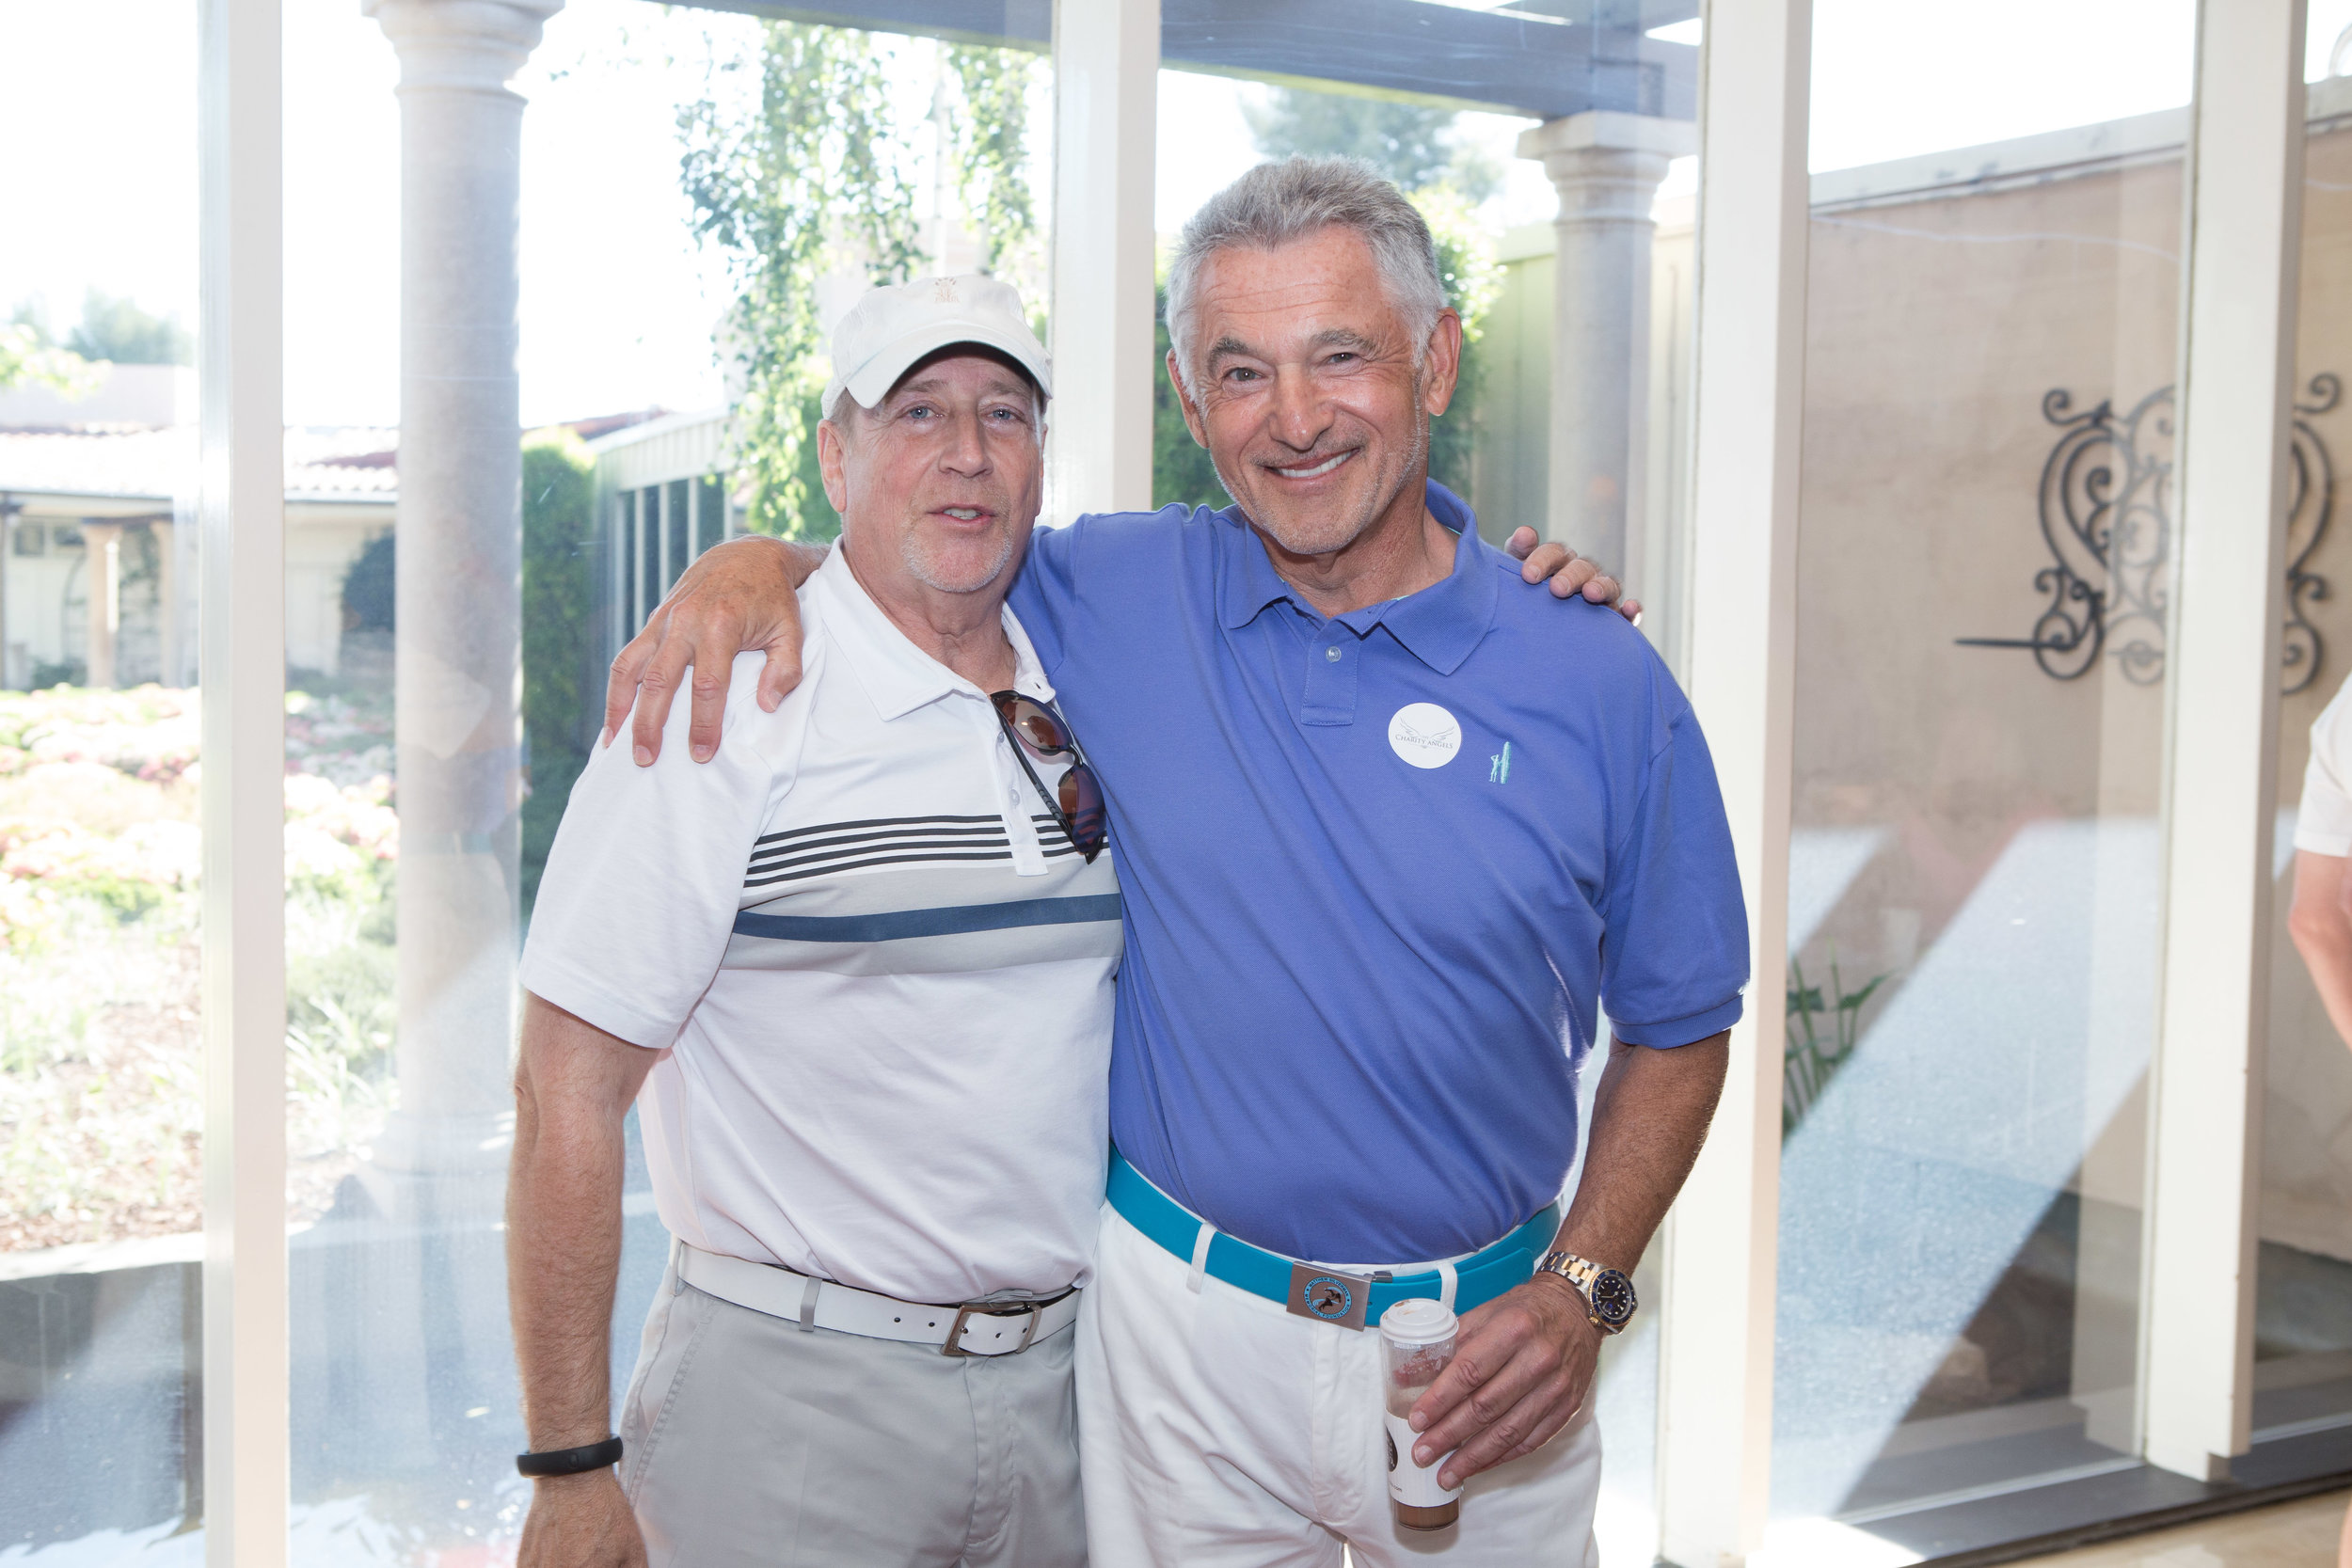 IMG_7664-Ron & Golfer.jpg